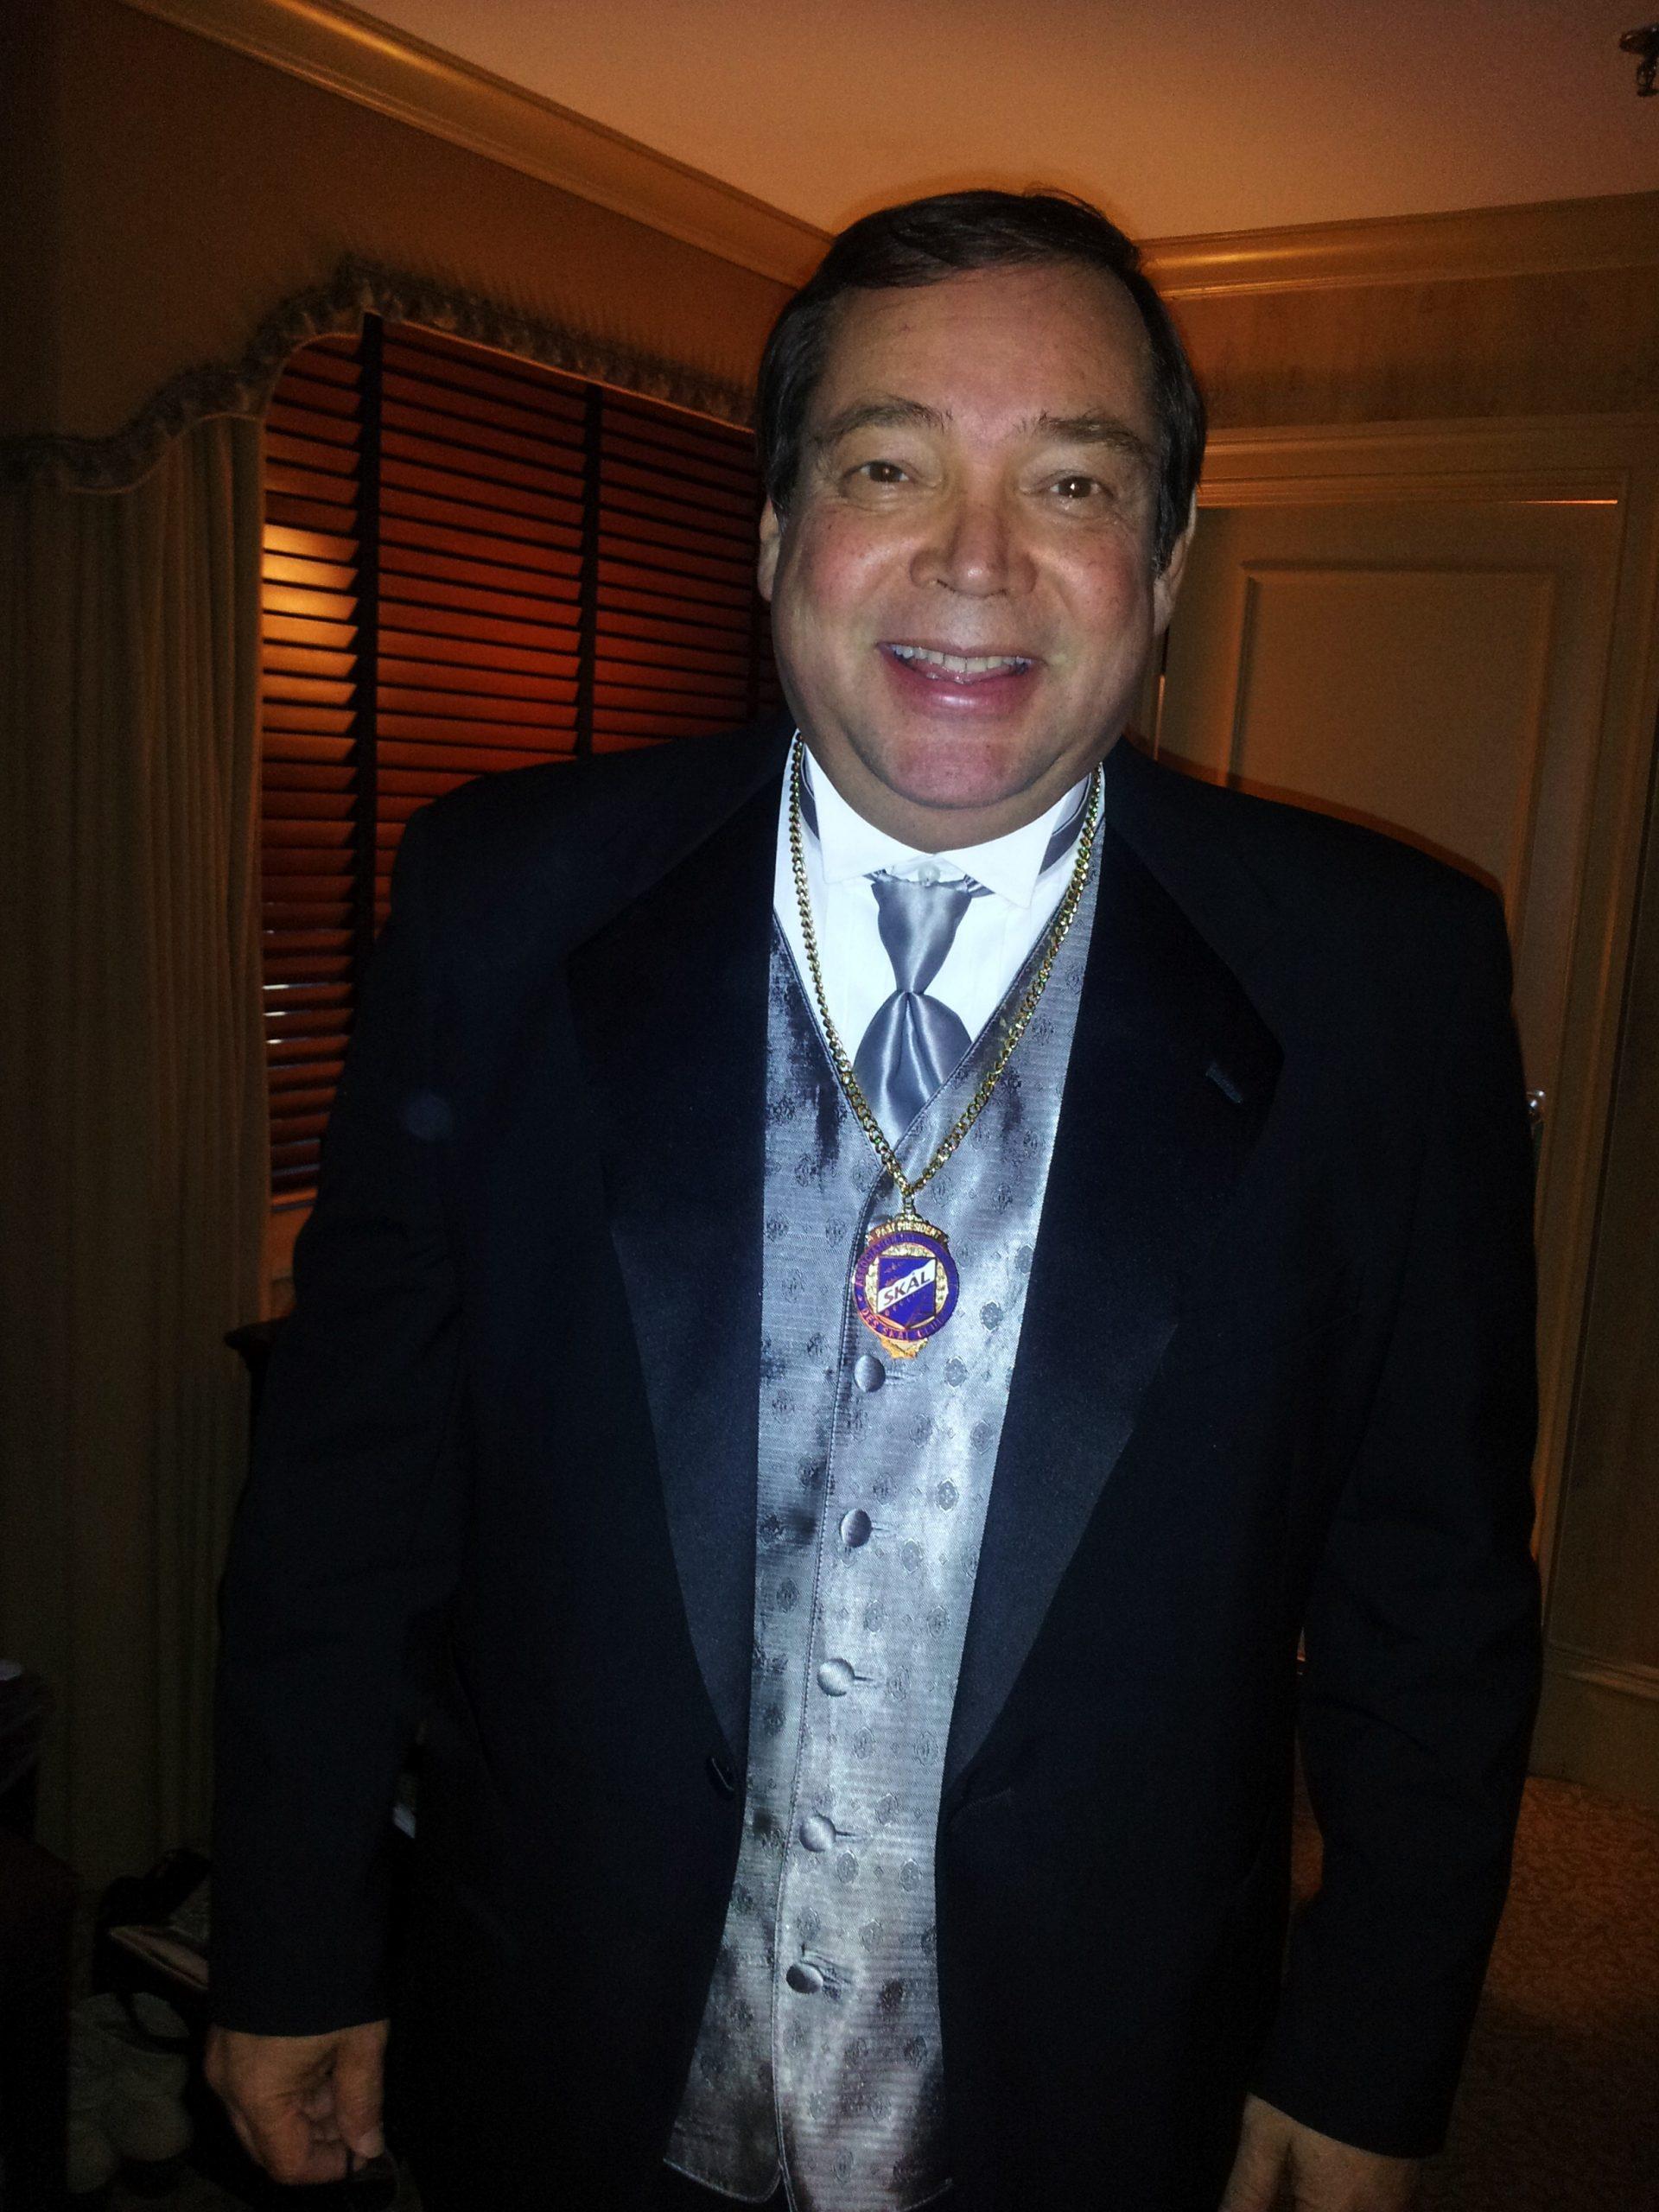 Ian Sauer, Summit Hospitality Group Ltd, Raleigh, NC, USA